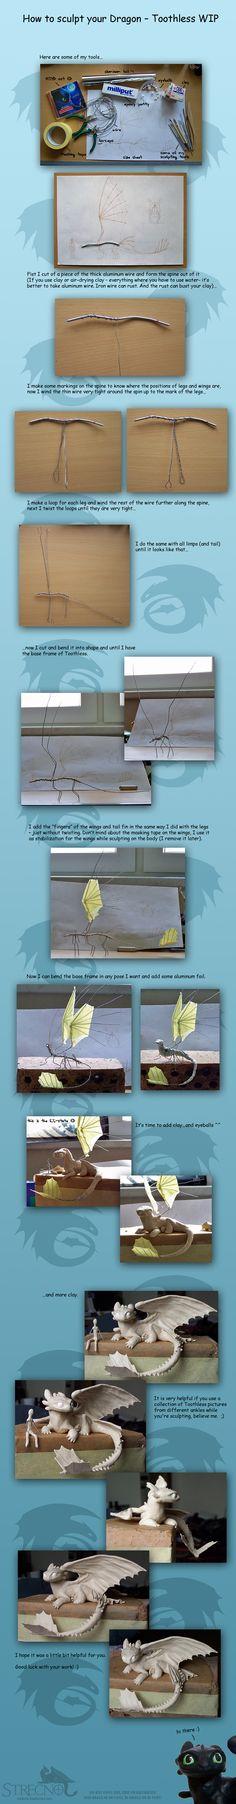 How to sculpt your Dragon by Strecno.deviantart.com on @deviantART